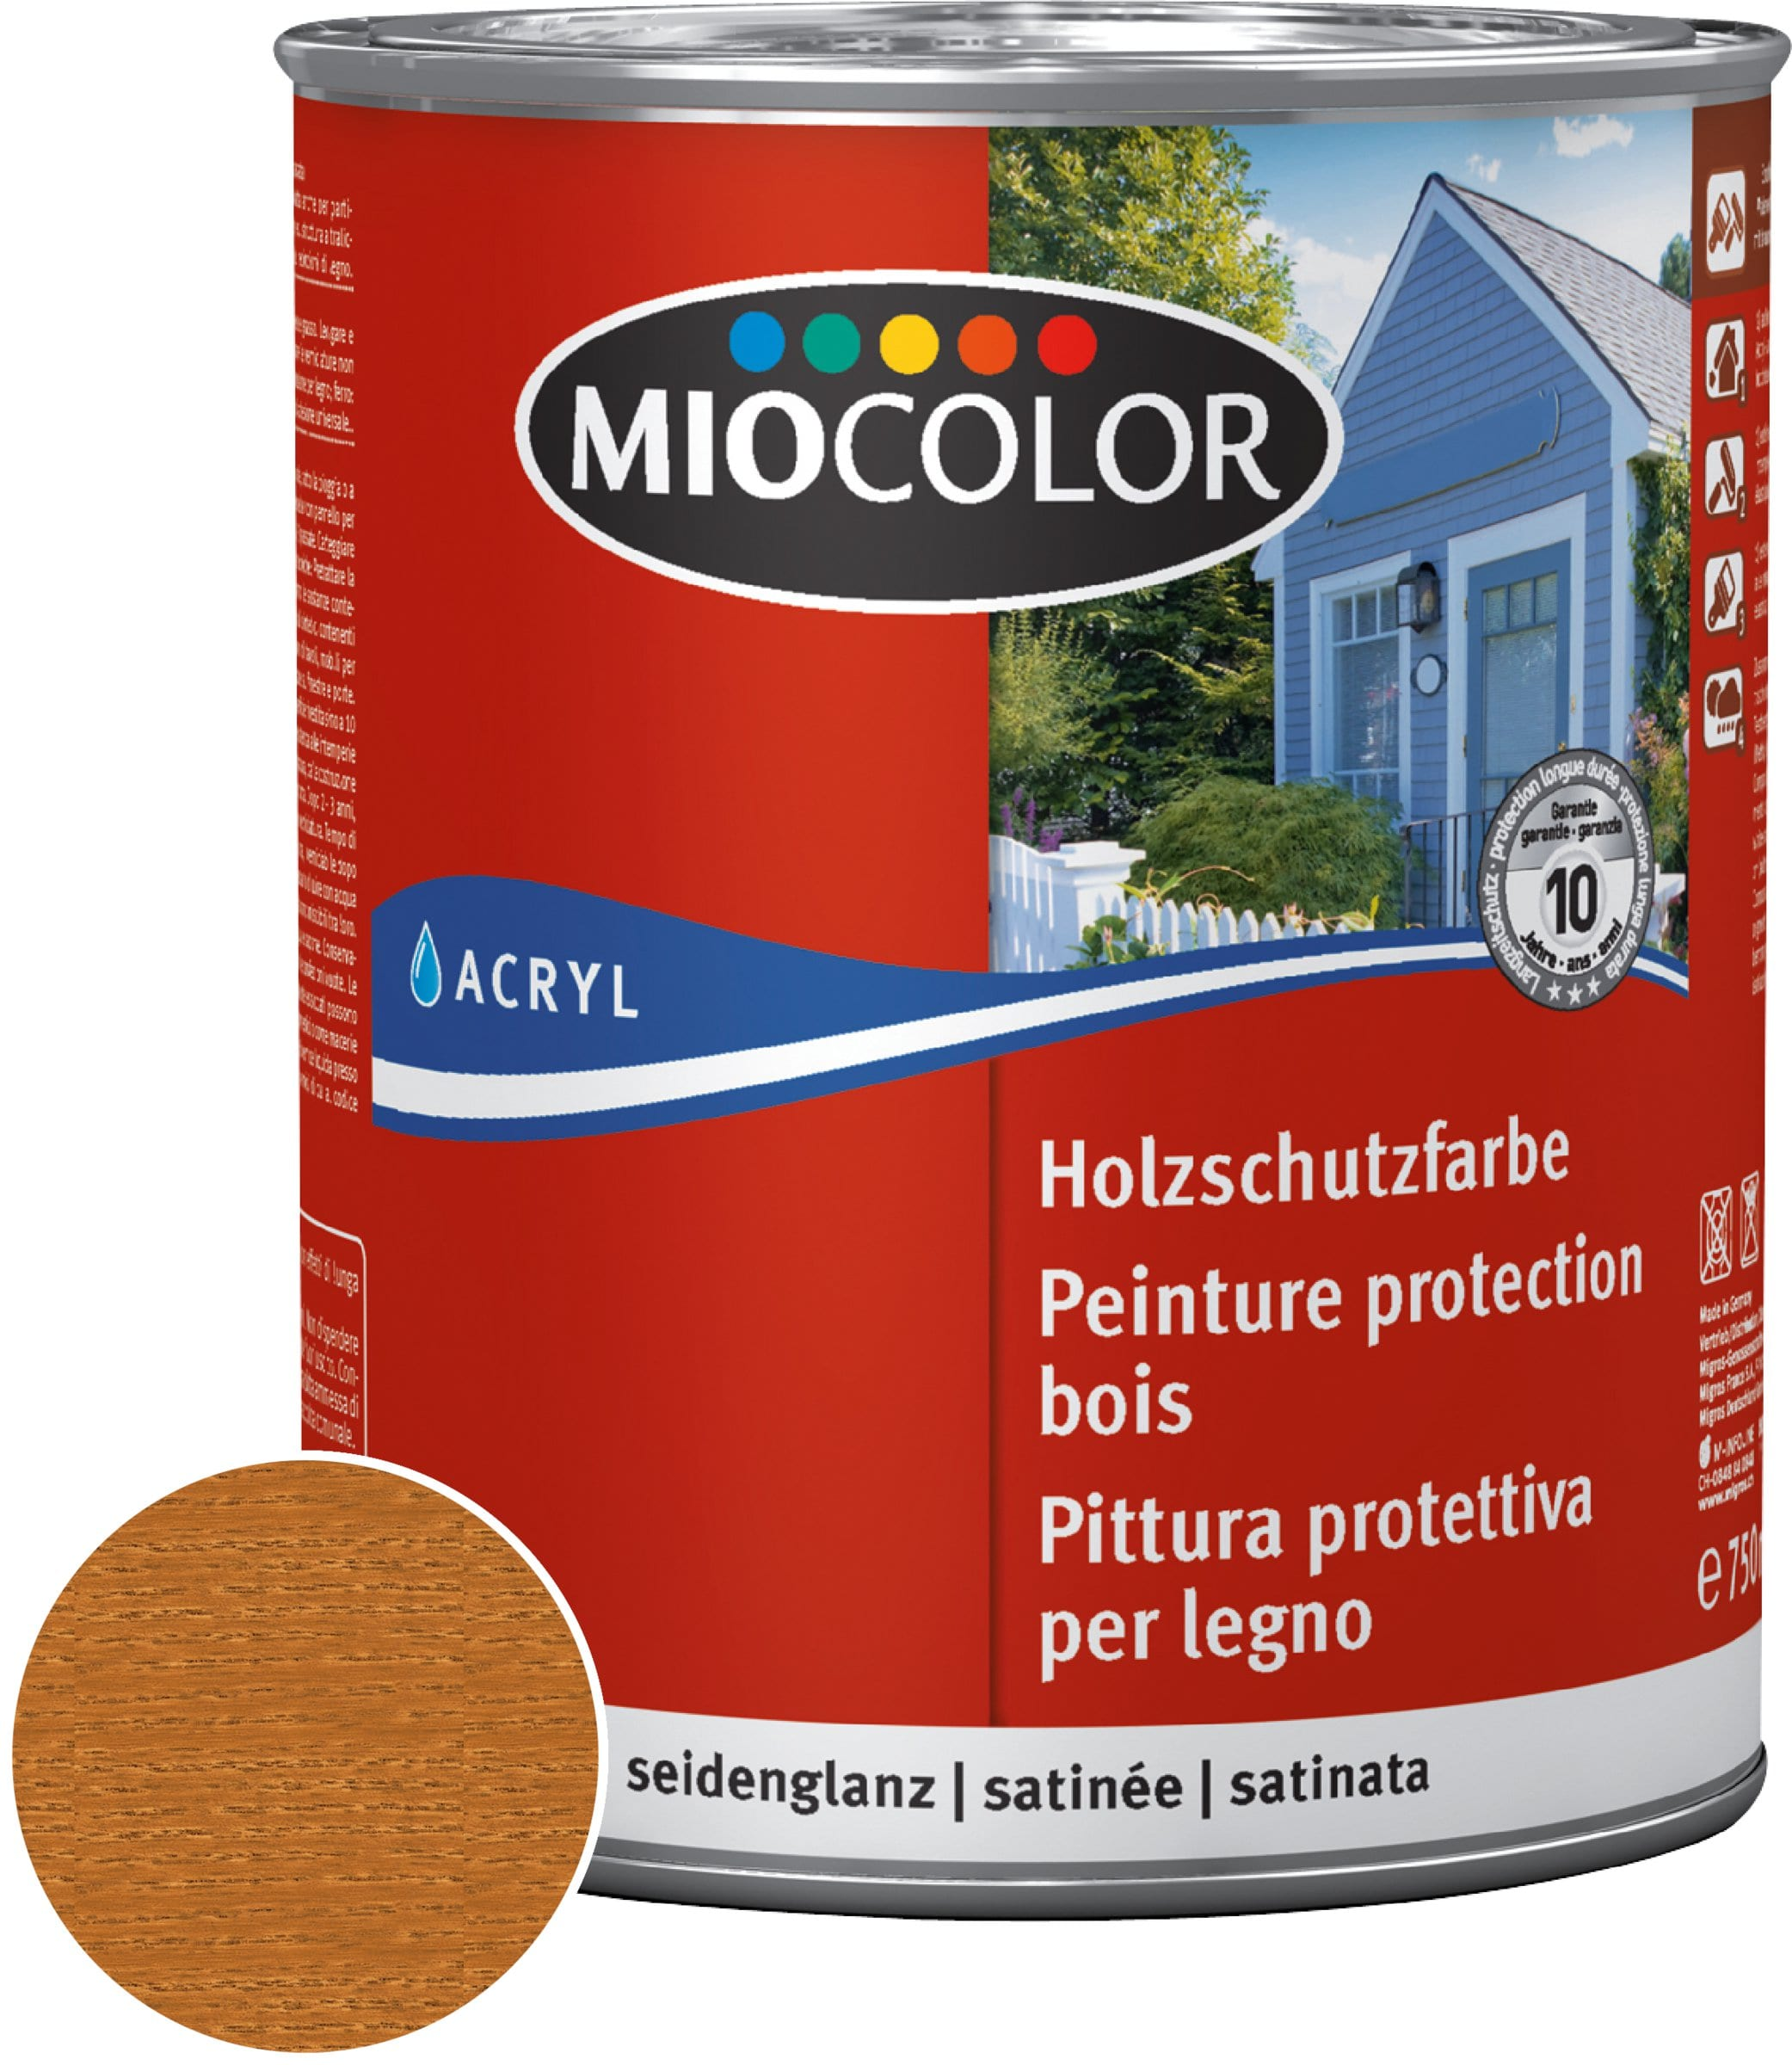 miocolor acryl holzlasur migipedia. Black Bedroom Furniture Sets. Home Design Ideas